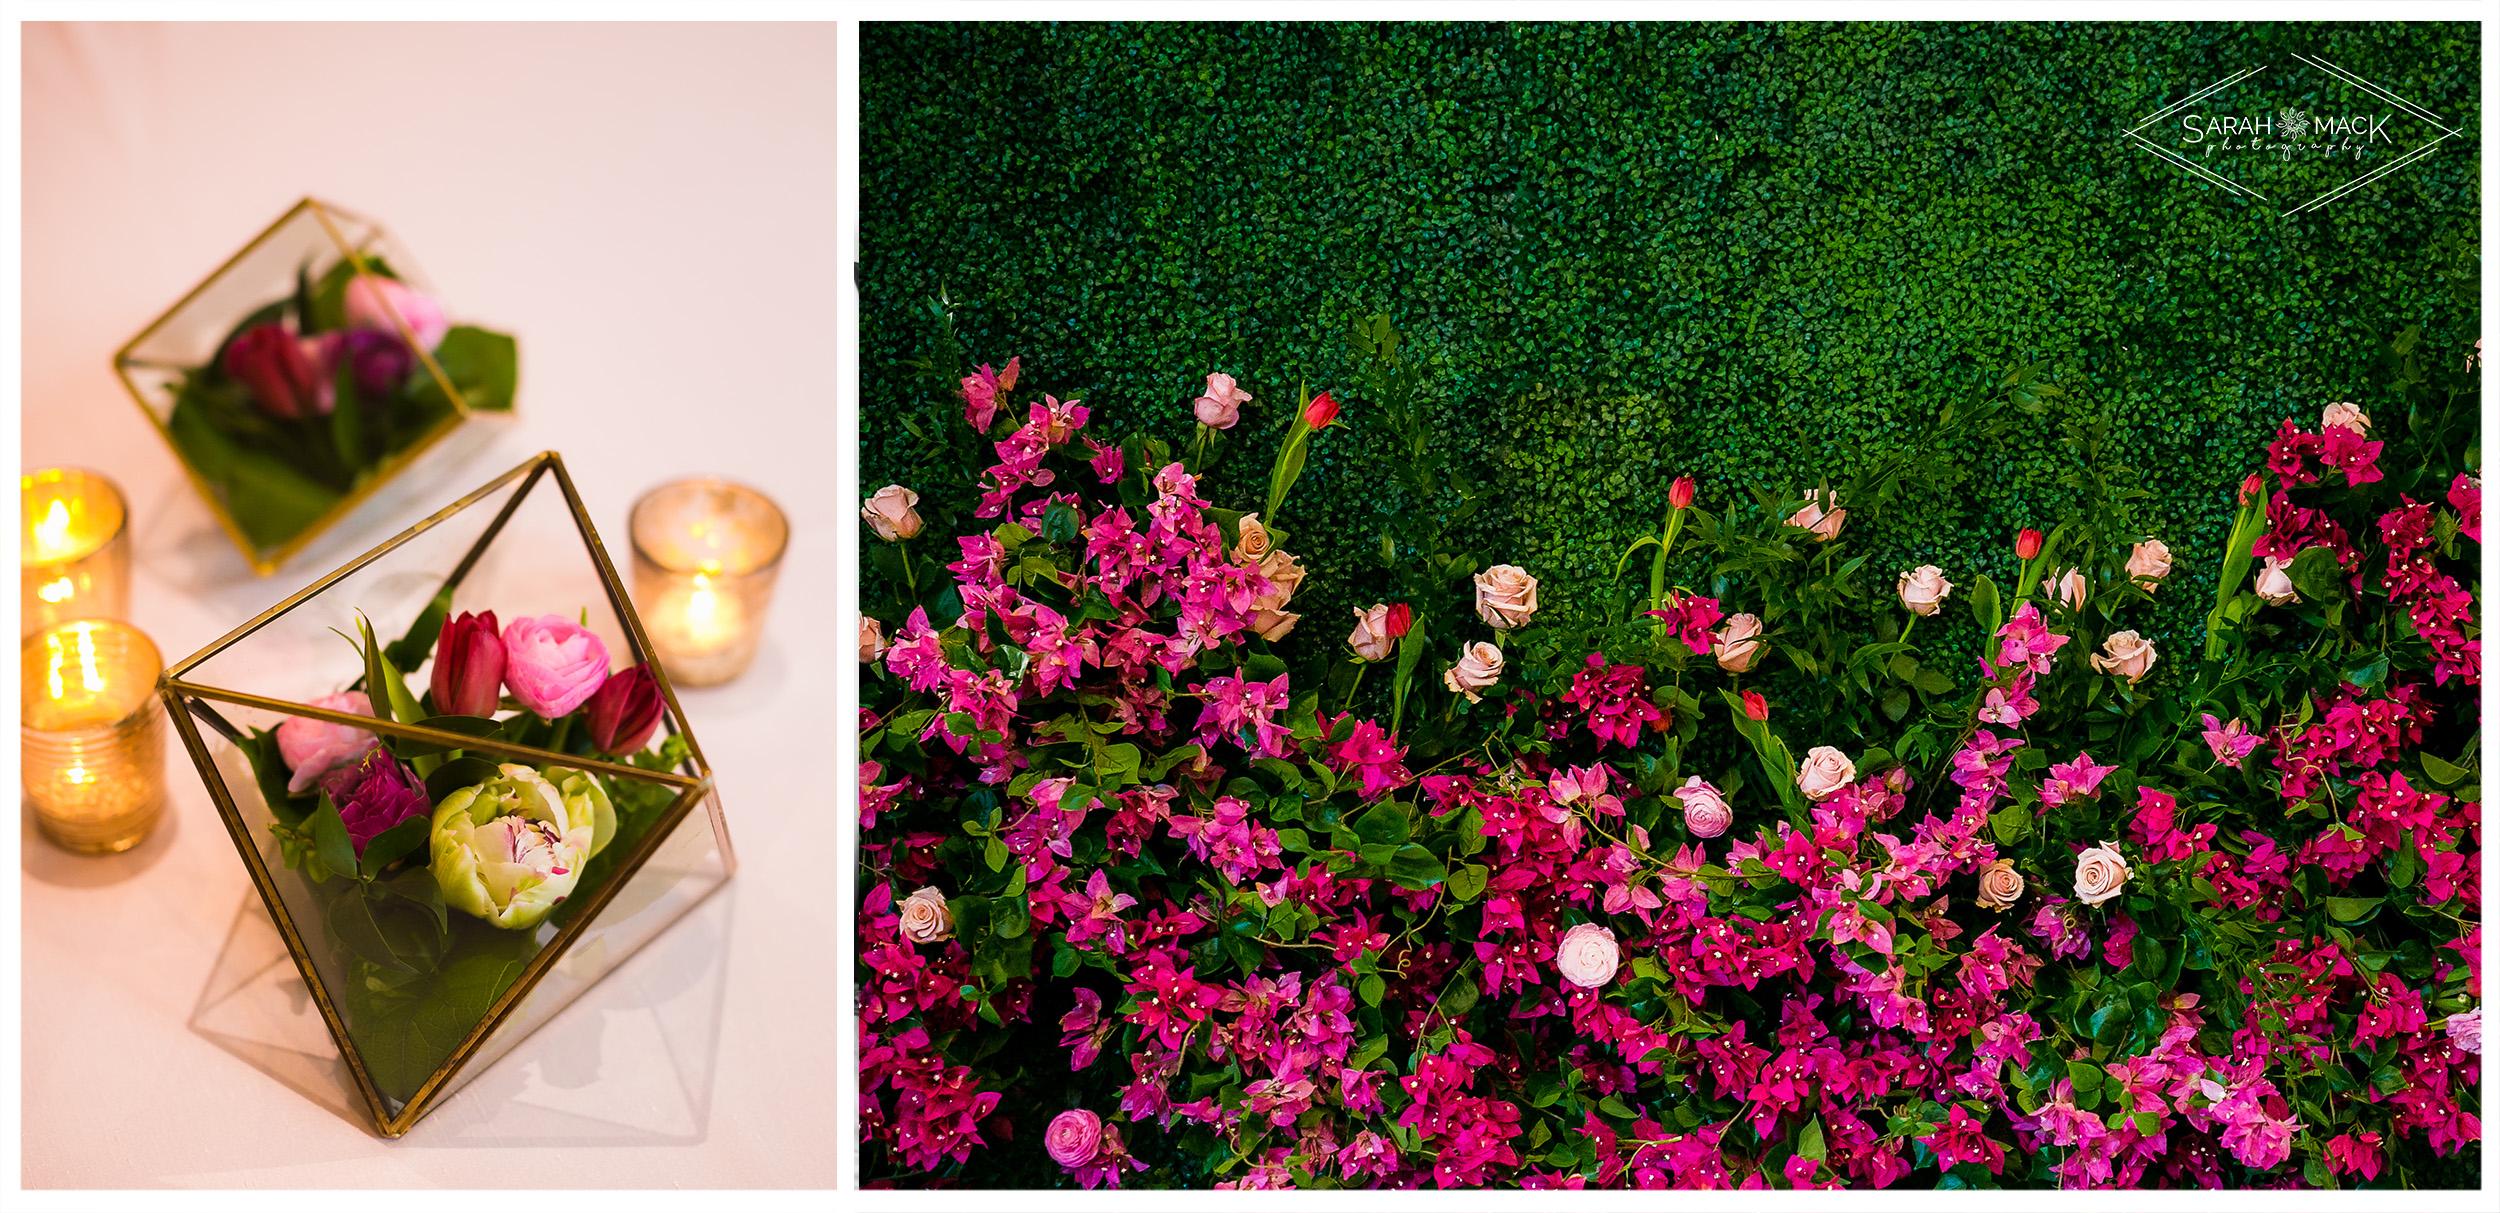 PR-Irvine-Ganesh-Pooja-Indian-Wedding-Photography-15.jpg